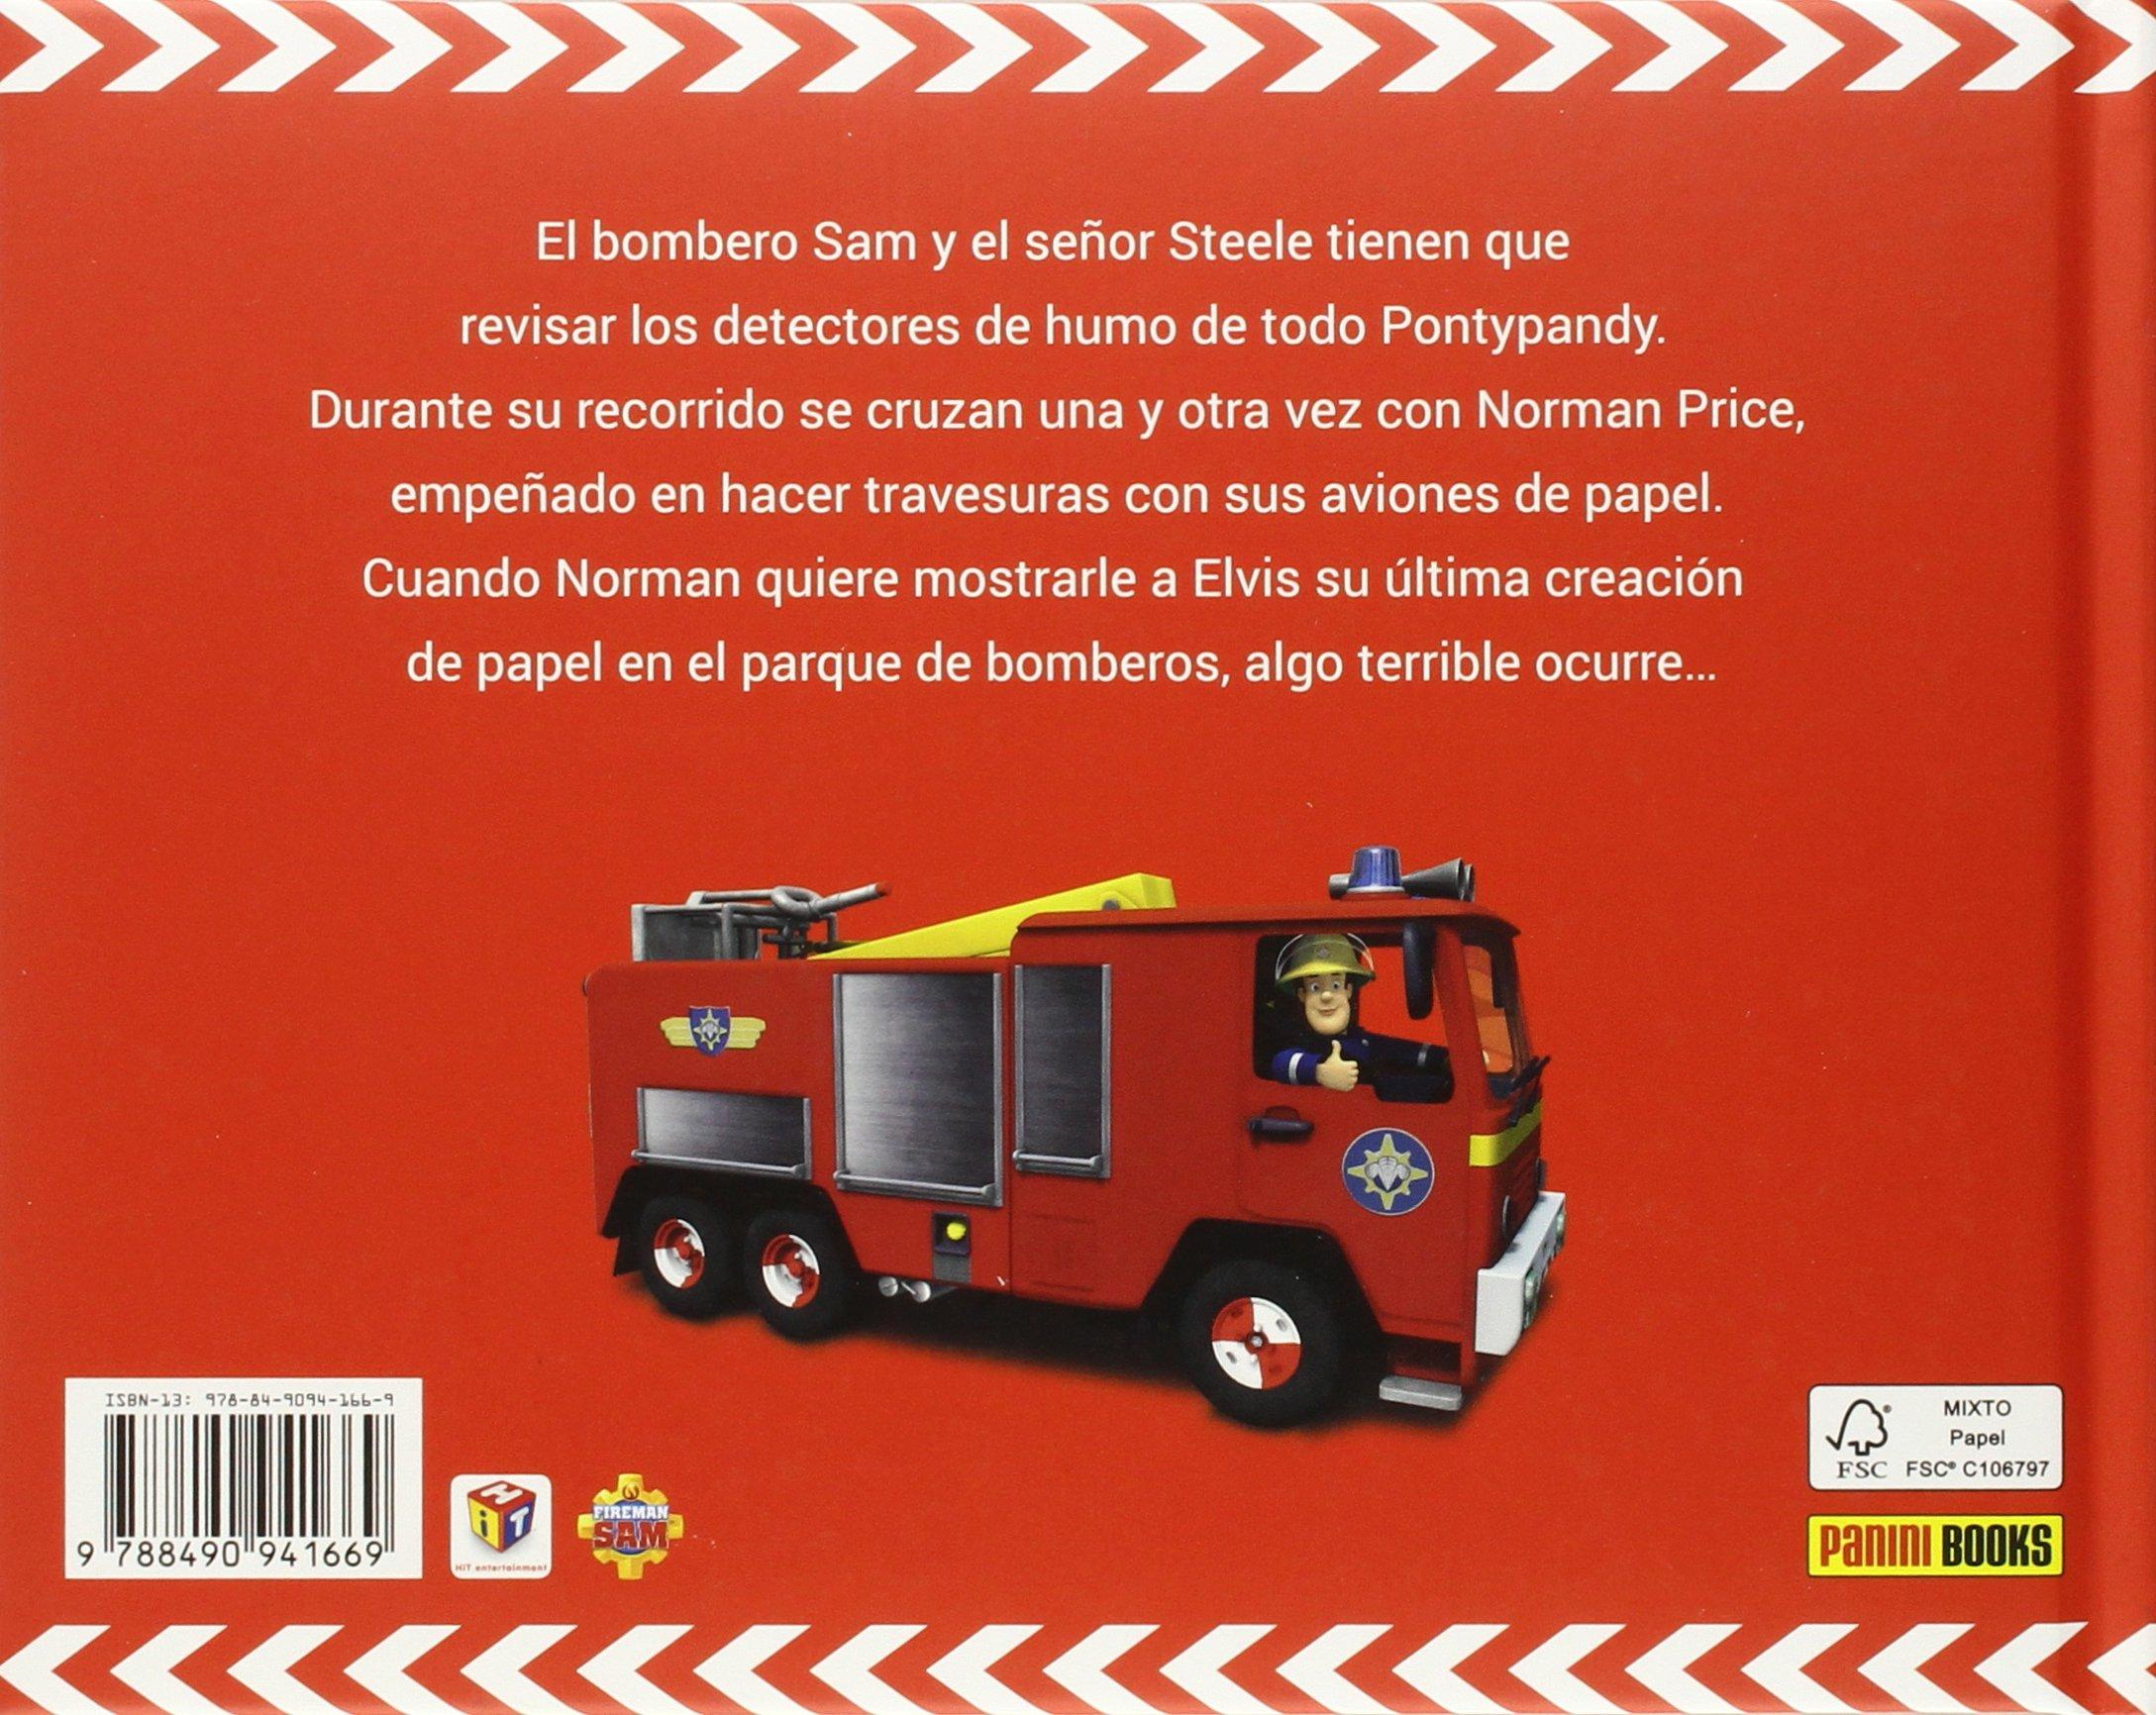 Sam el bombero. Incendio en el parque de bomberos.: 9788490941669: Amazon.com: Books